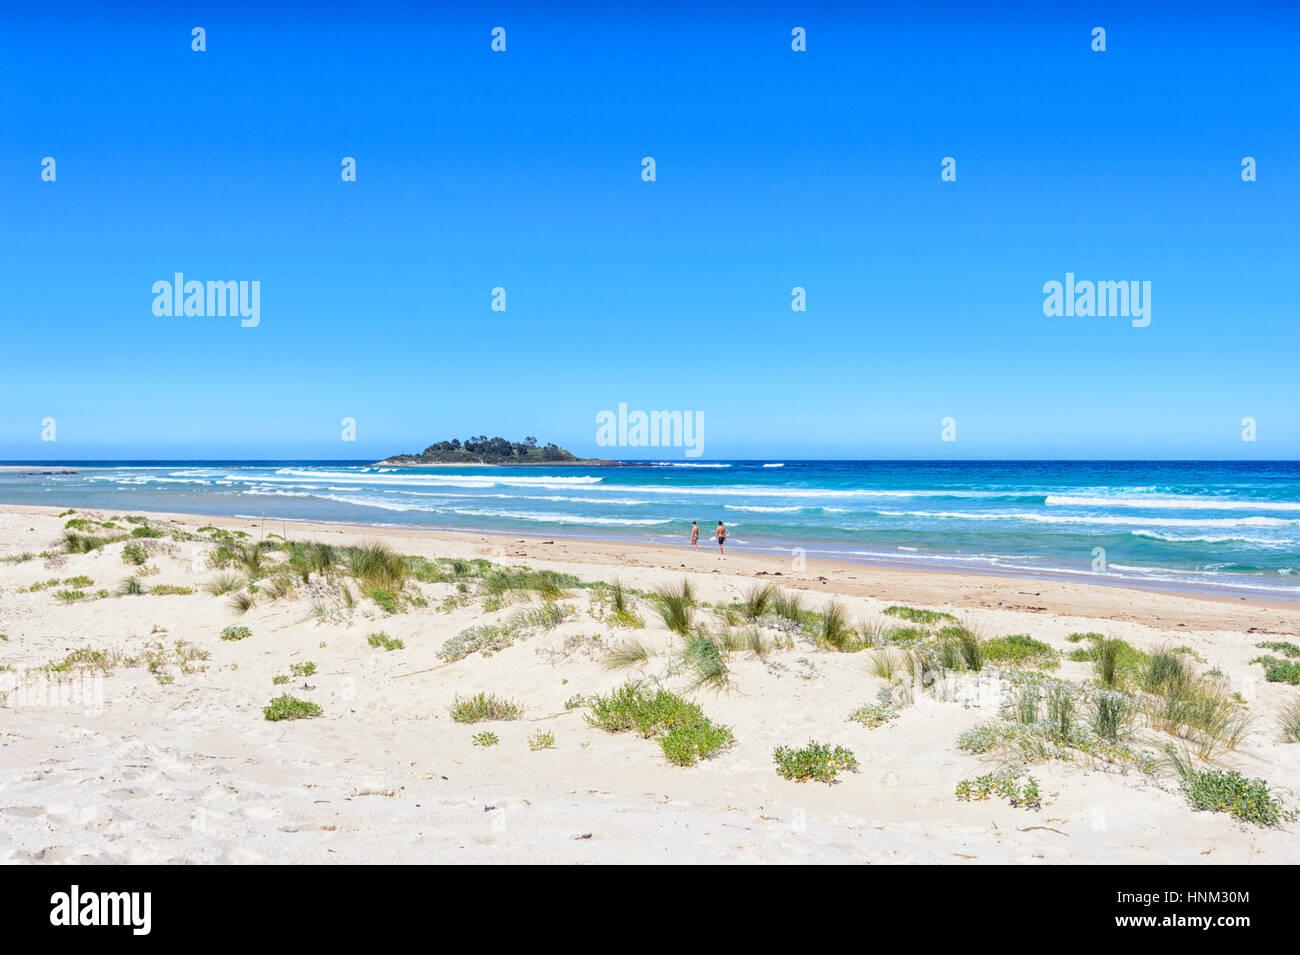 Sand beach at Lake Conjola, Shoalhaven, South Coast, New South Wales, NSW, Australia - Stock Image